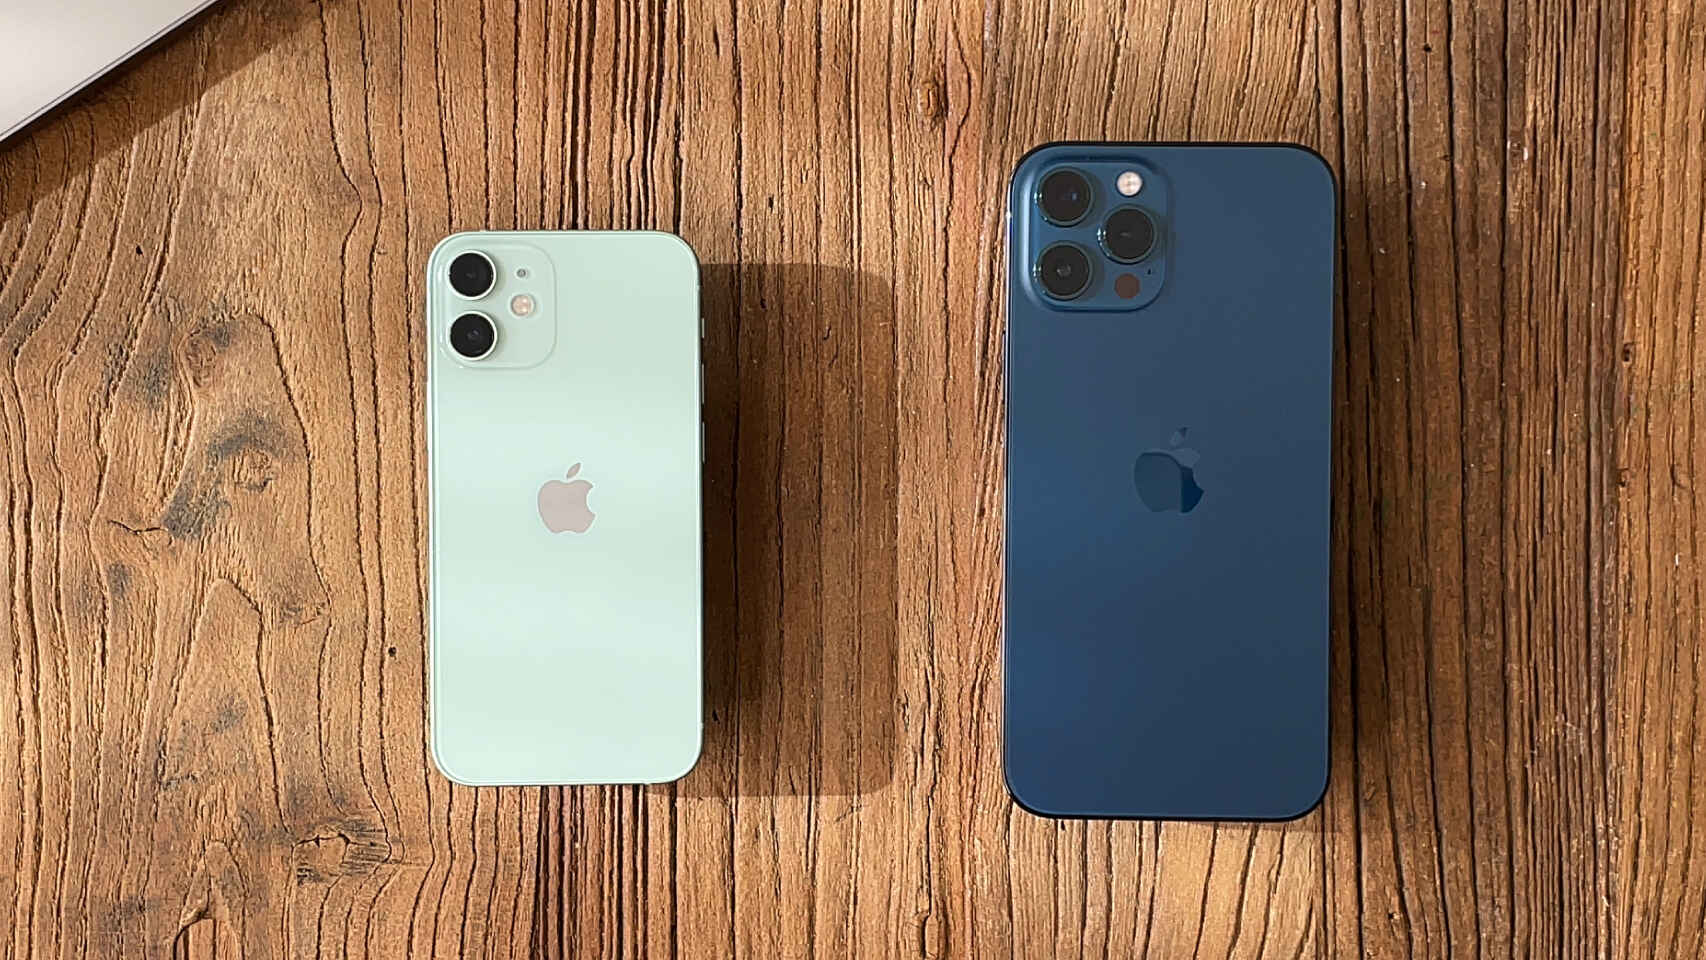 iPhone 12 mini (izquierda) comparado con un iPhone 12 Pro Max